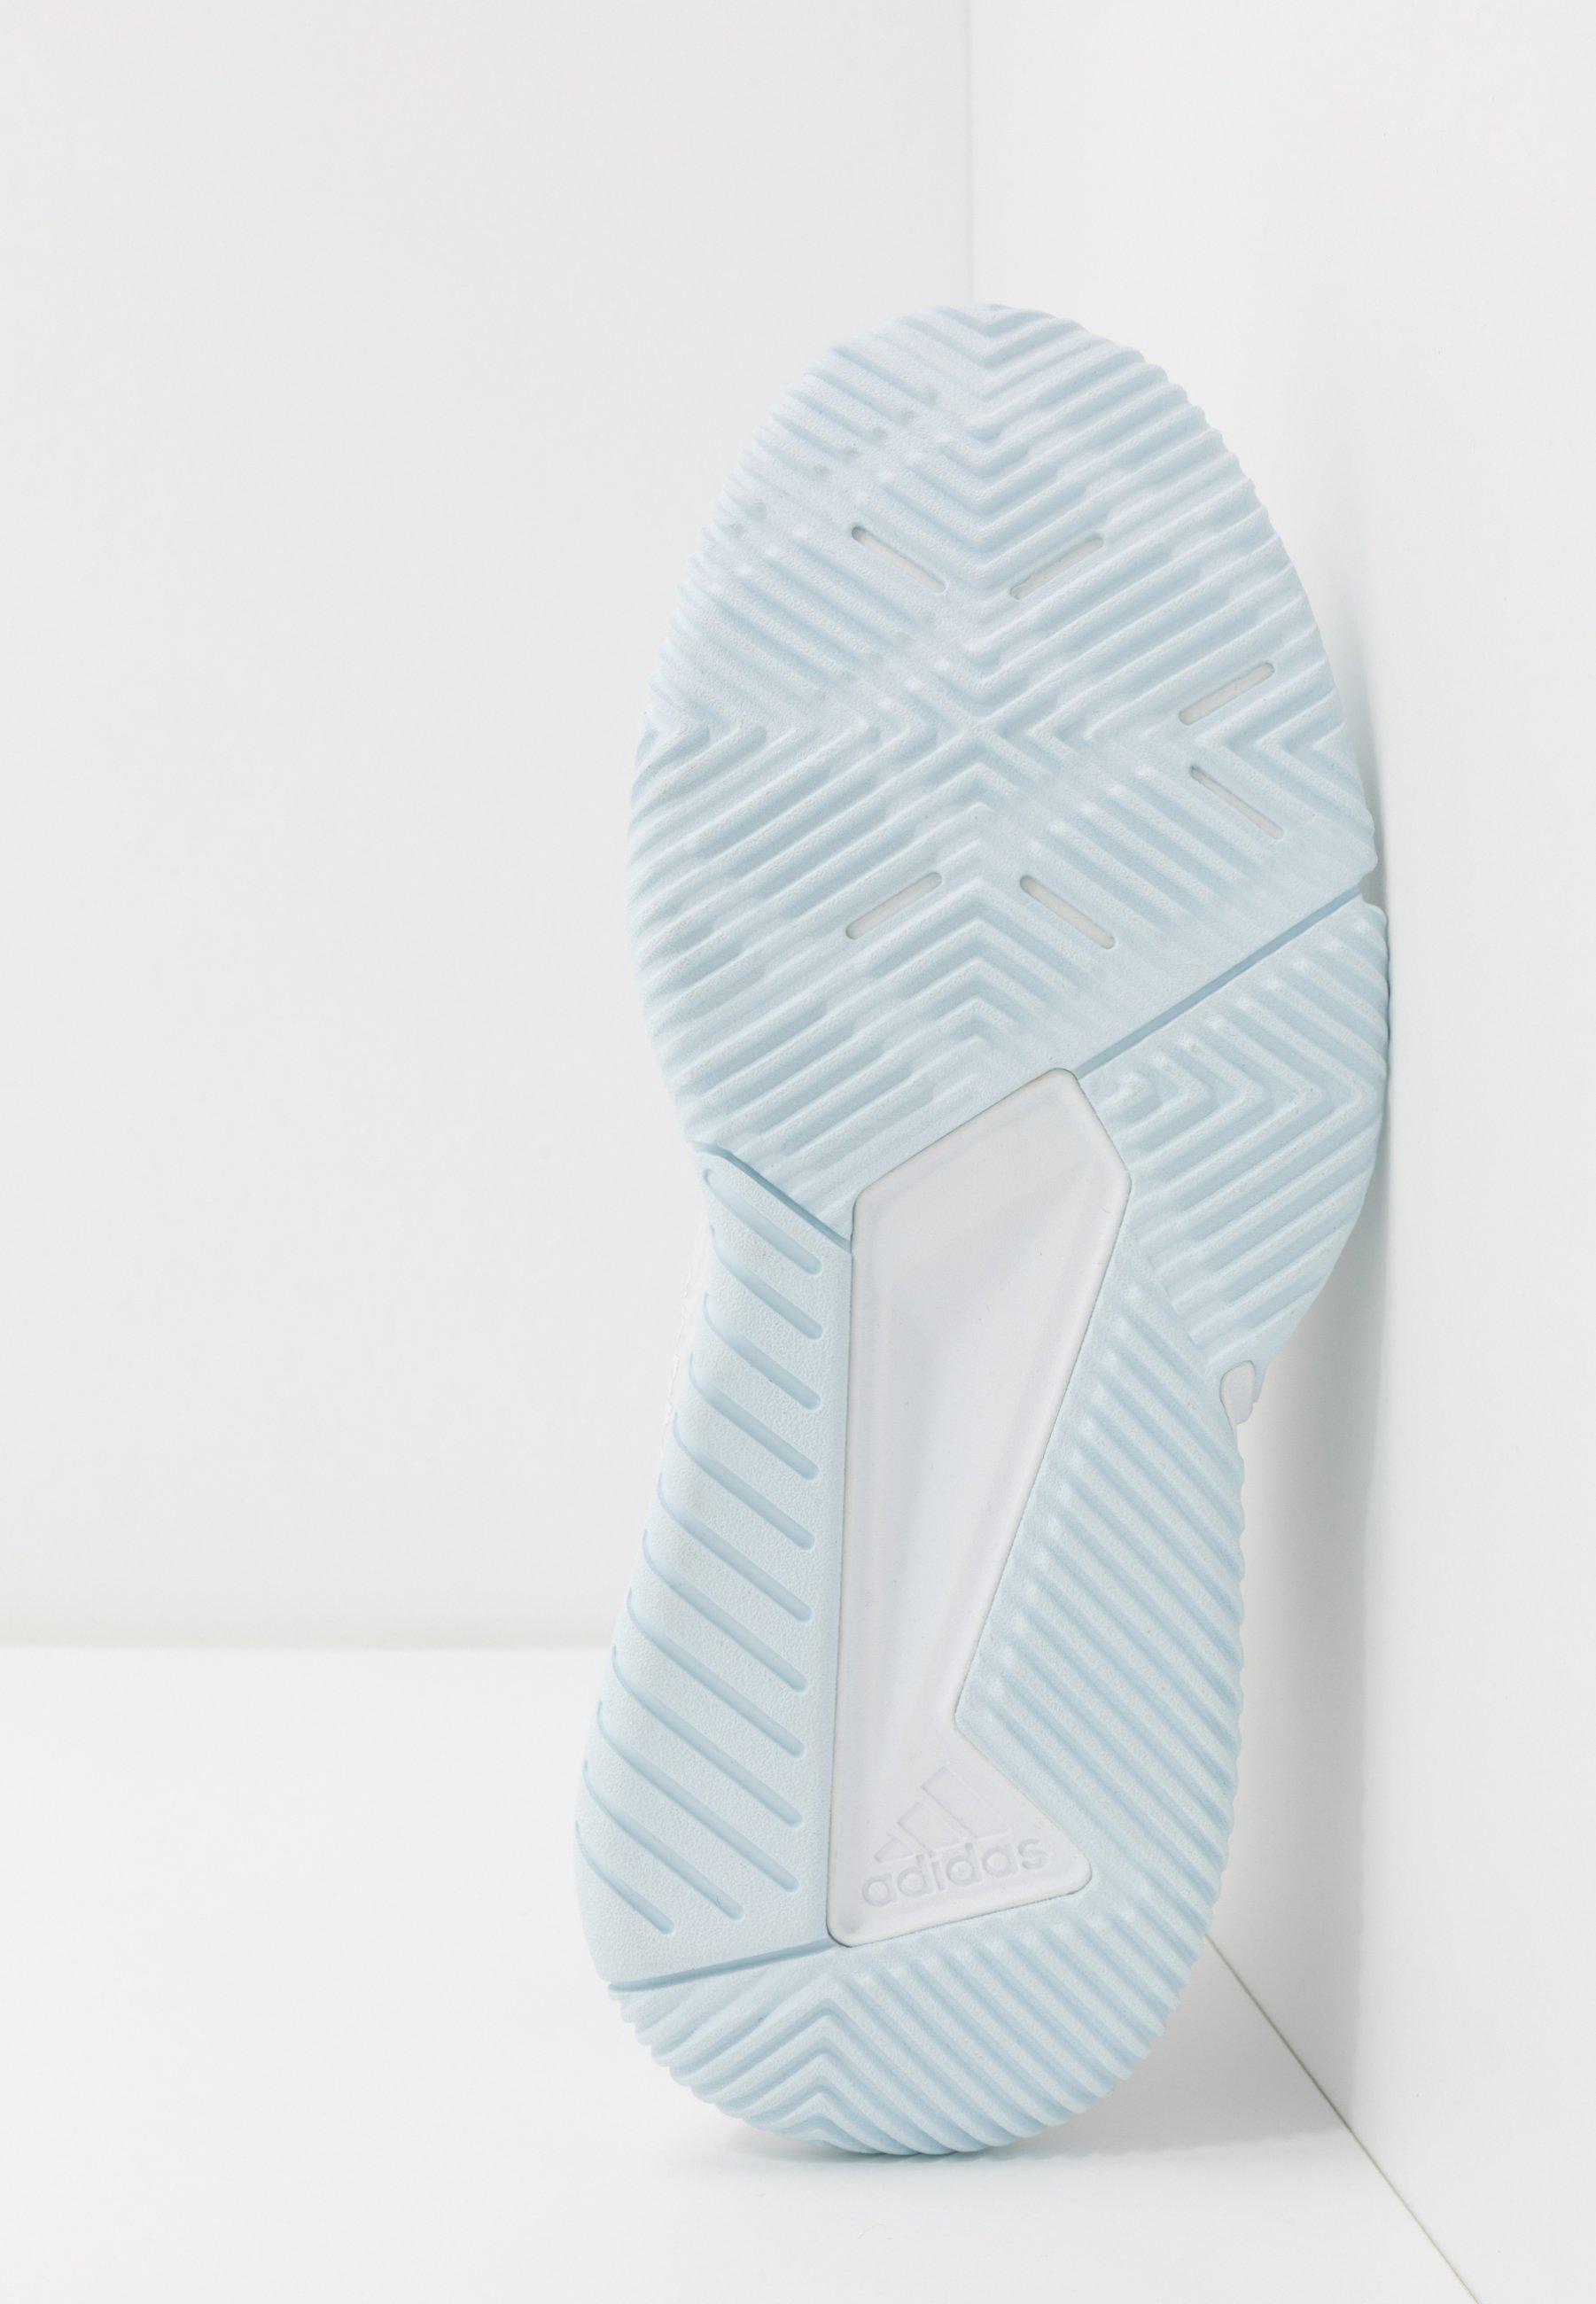 2020 Cool Women's Shoes adidas Performance COURT TEAM BOUNCE Handball shoes sky tint/footwear white/signal orange HyaBBlP9q